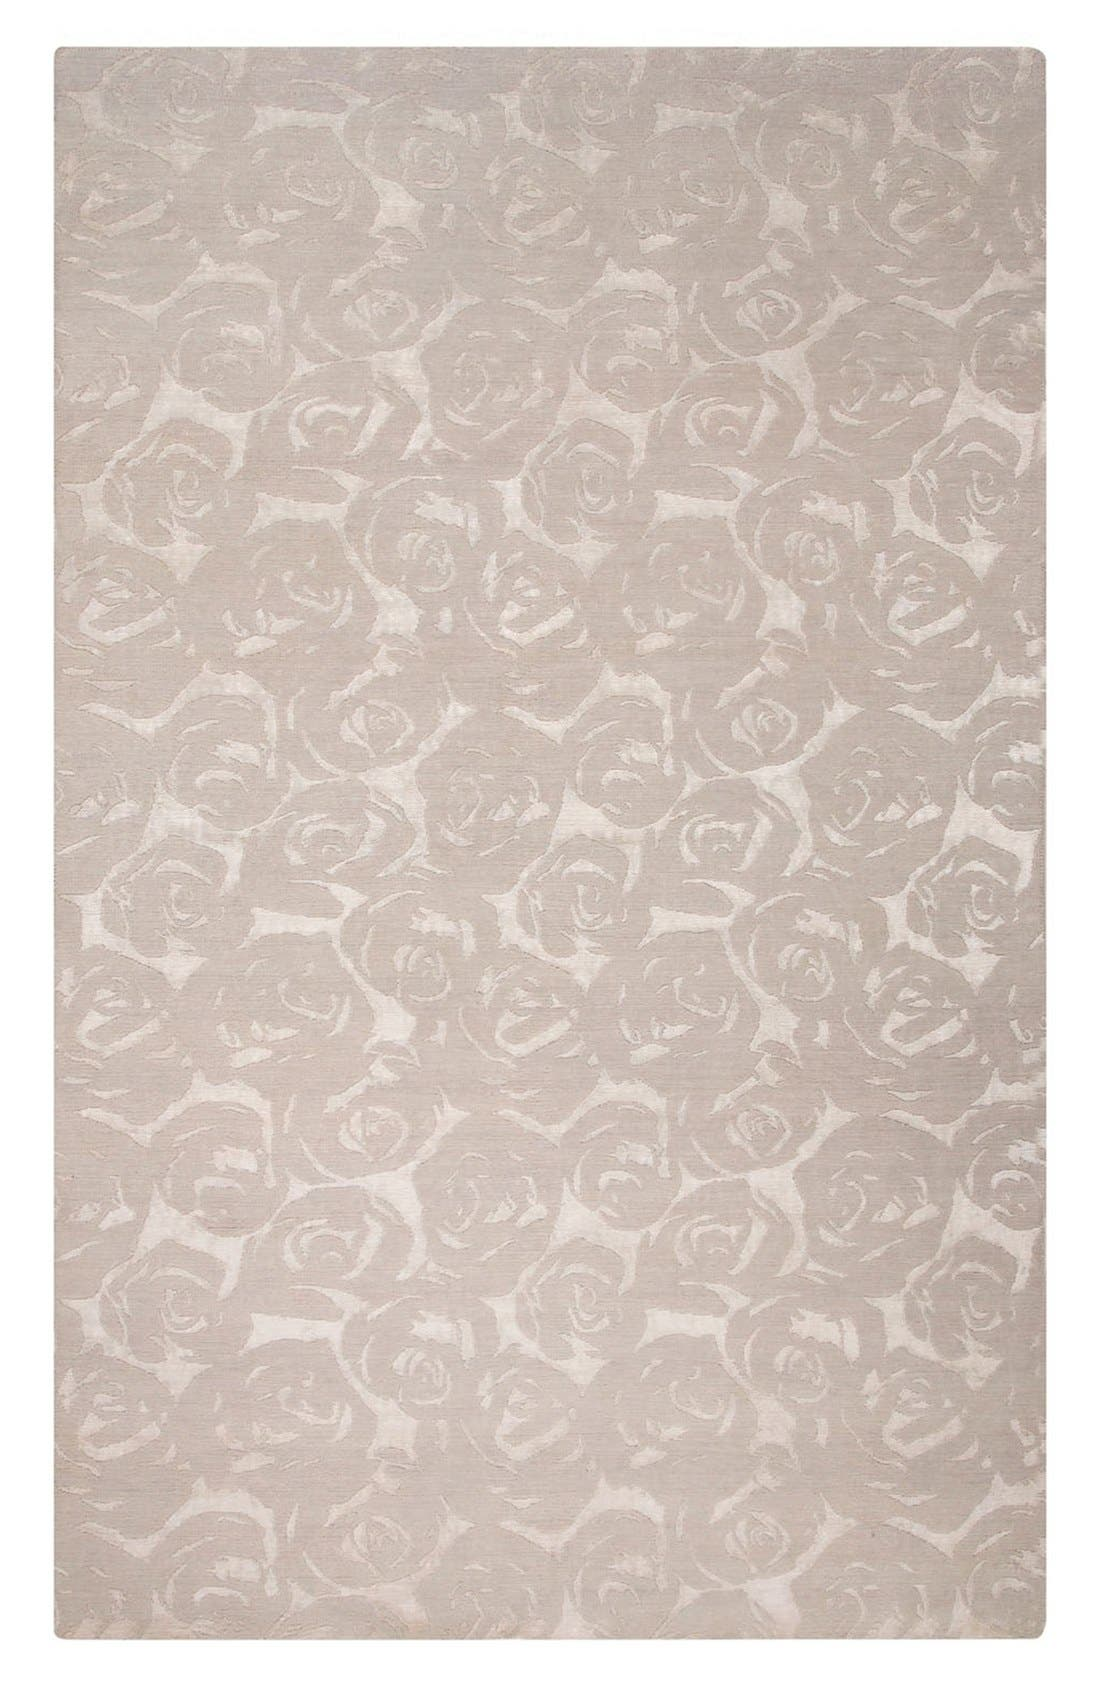 kate spade new york 'noho' premium wool blend rug